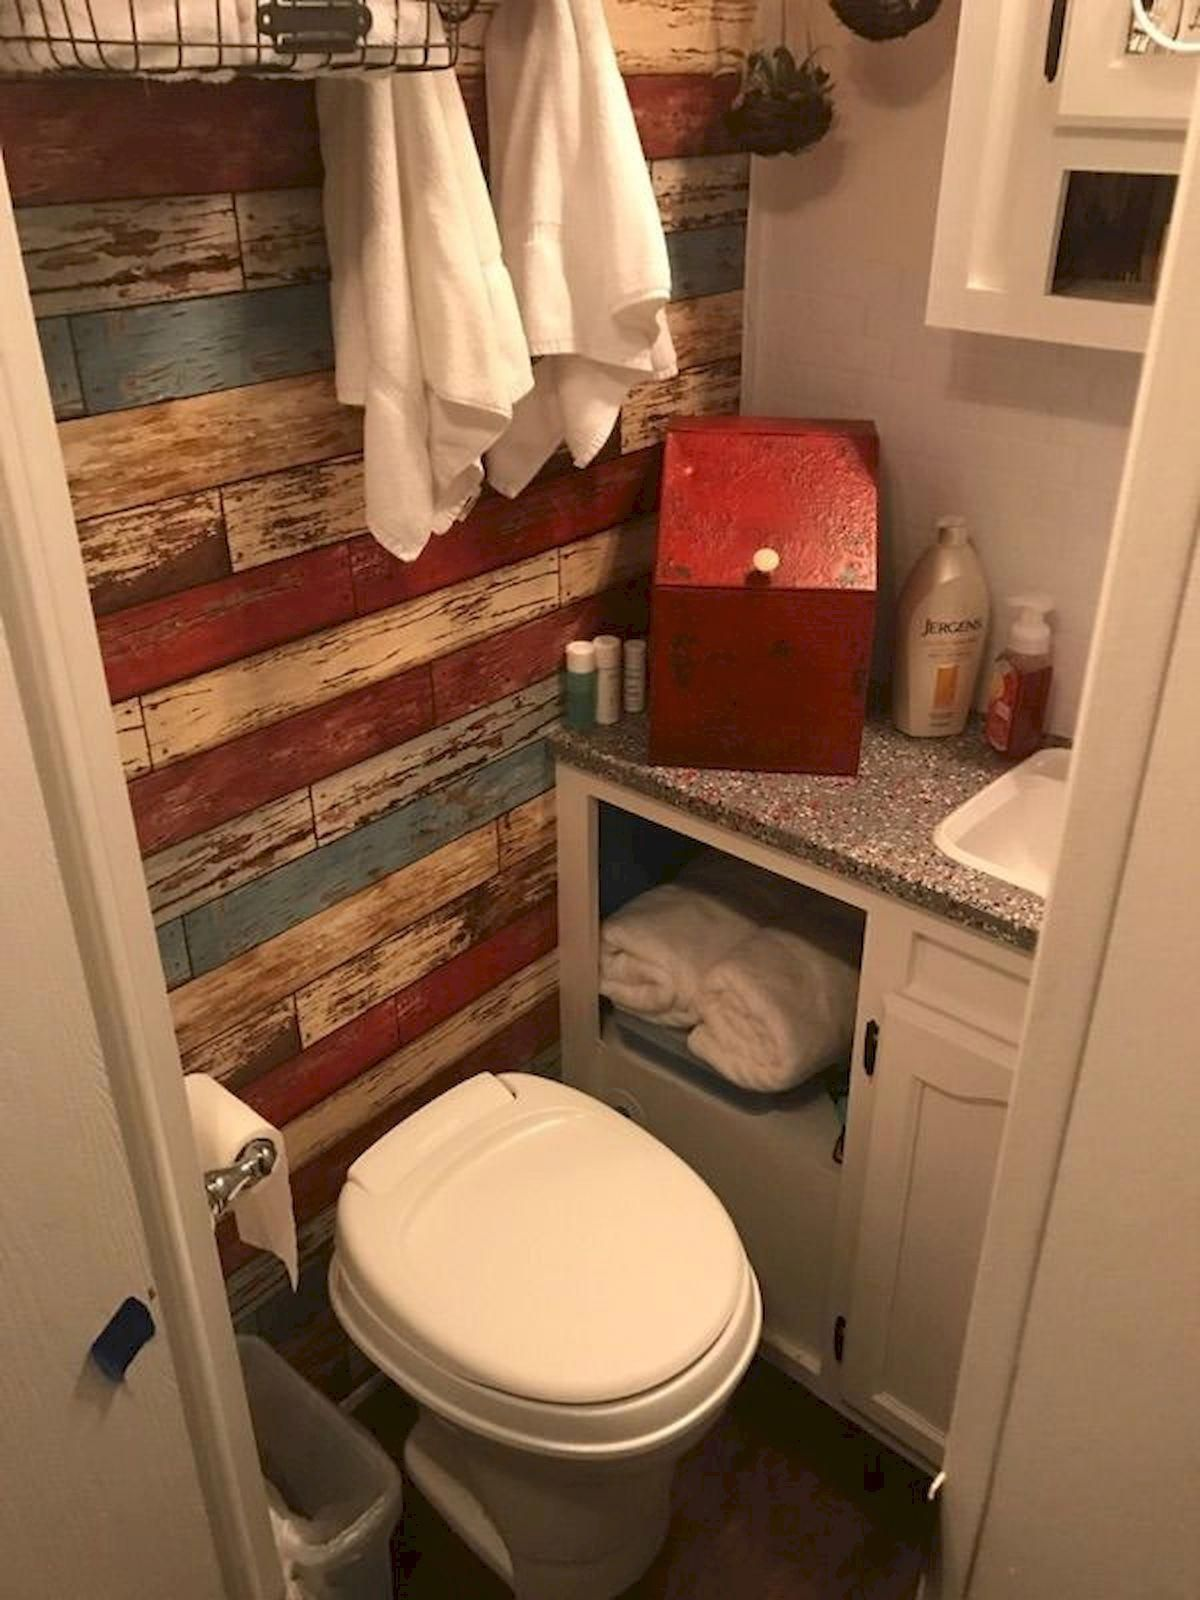 remodeledkitchens  Umgebaute wohnmobile, Badezimmer im wohnwagen